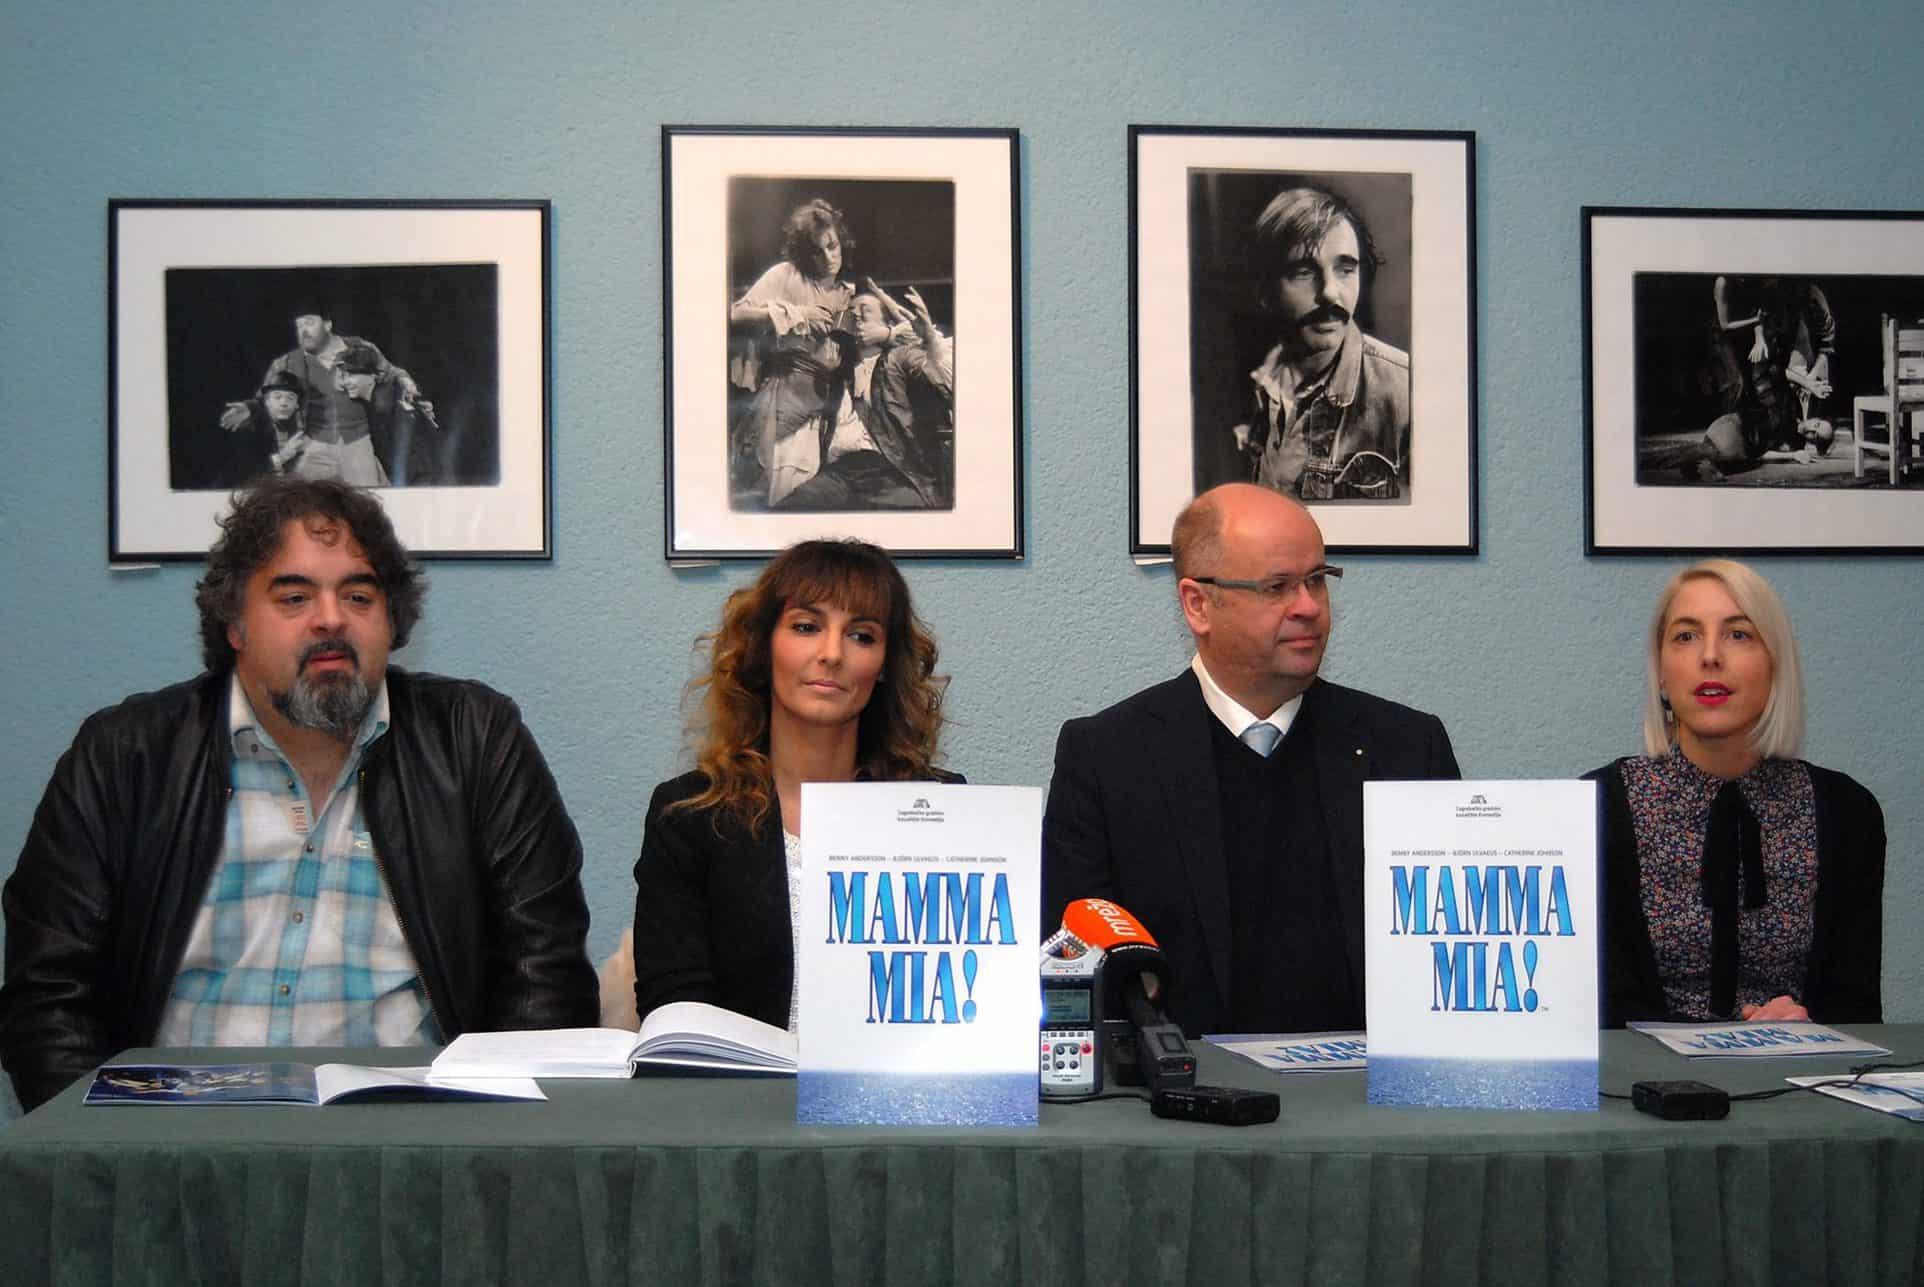 Mamma Mia Photo by Adam Vidas